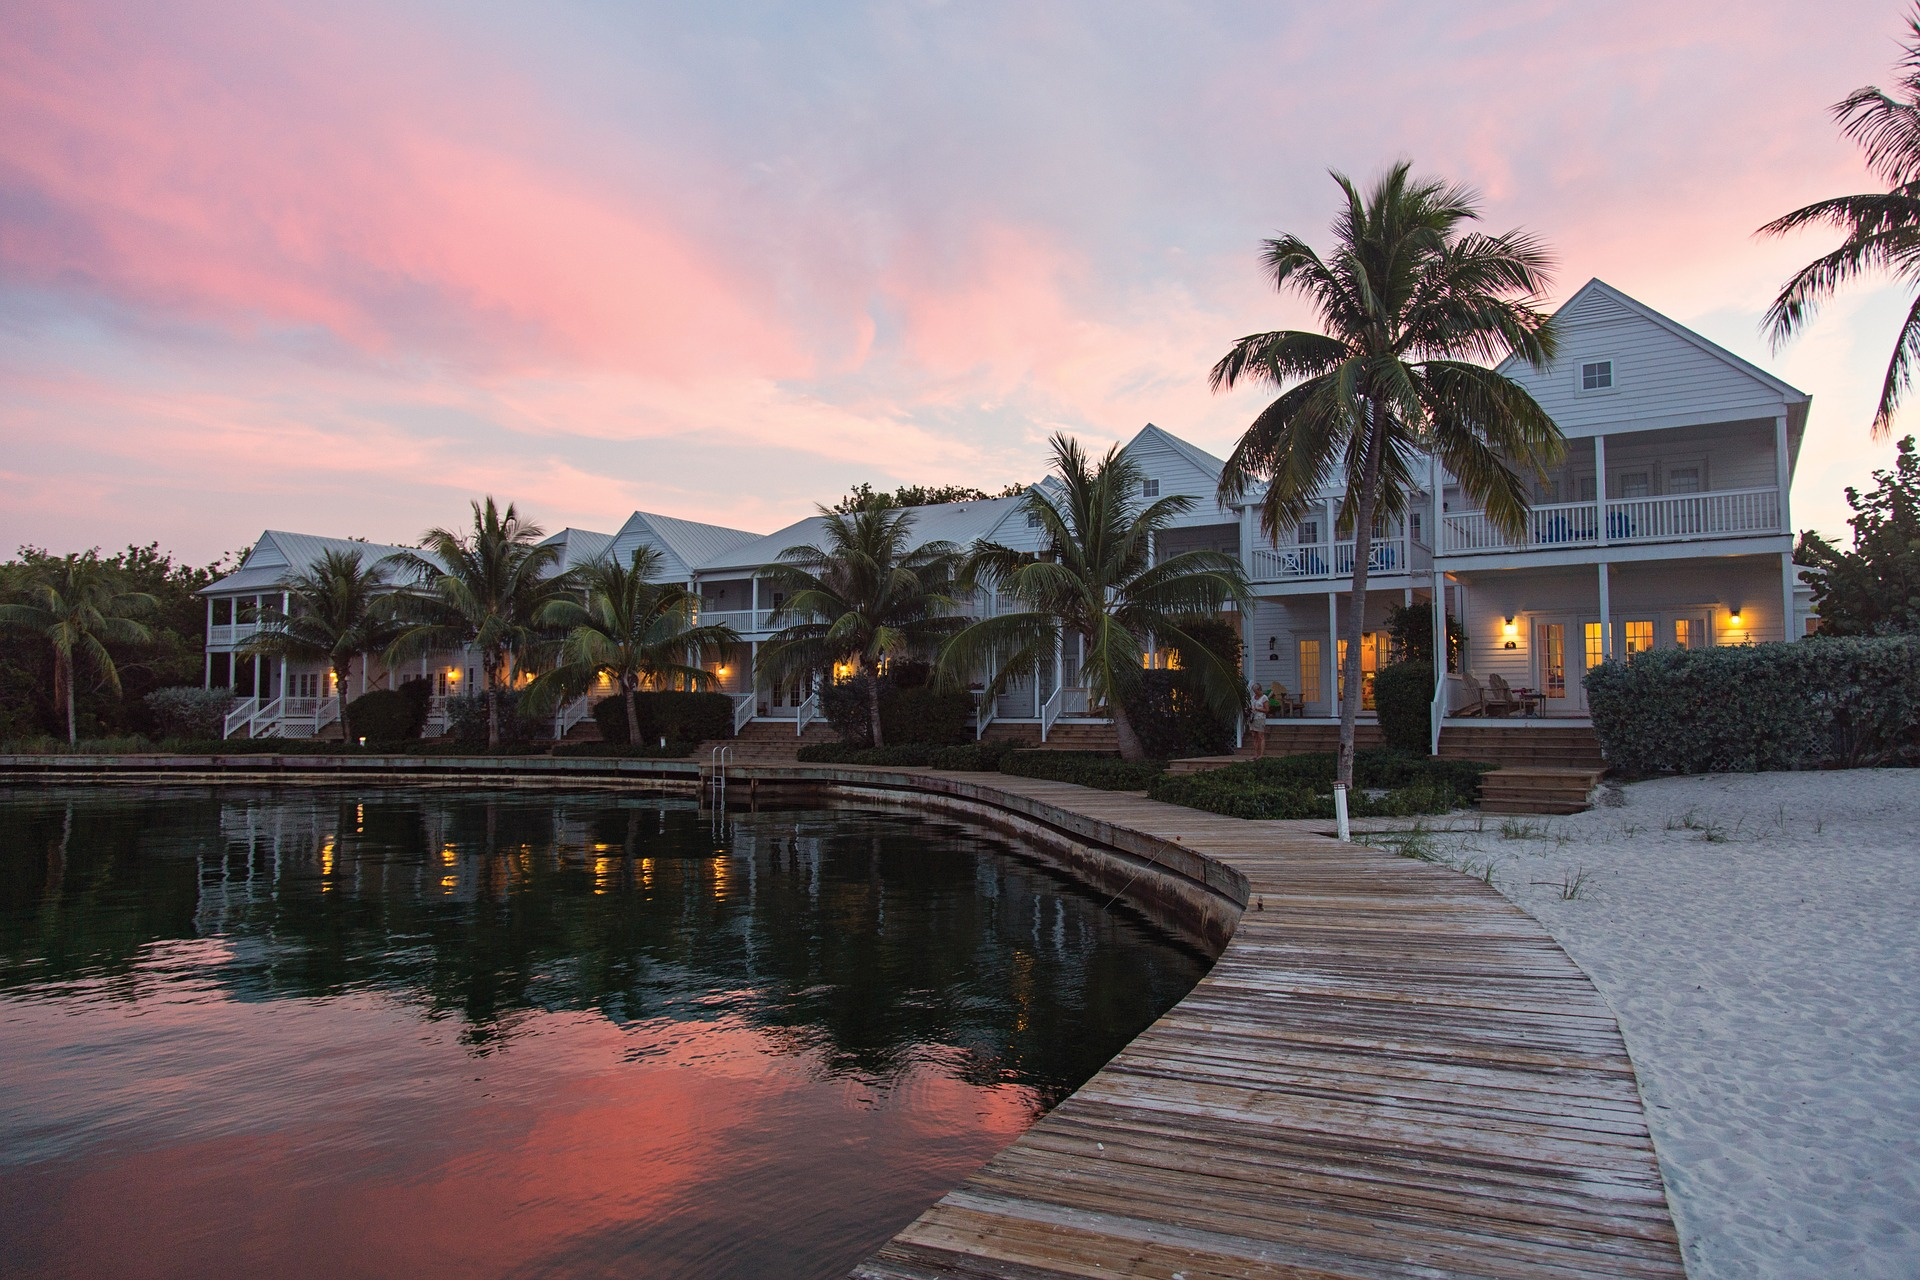 palm bay Florida